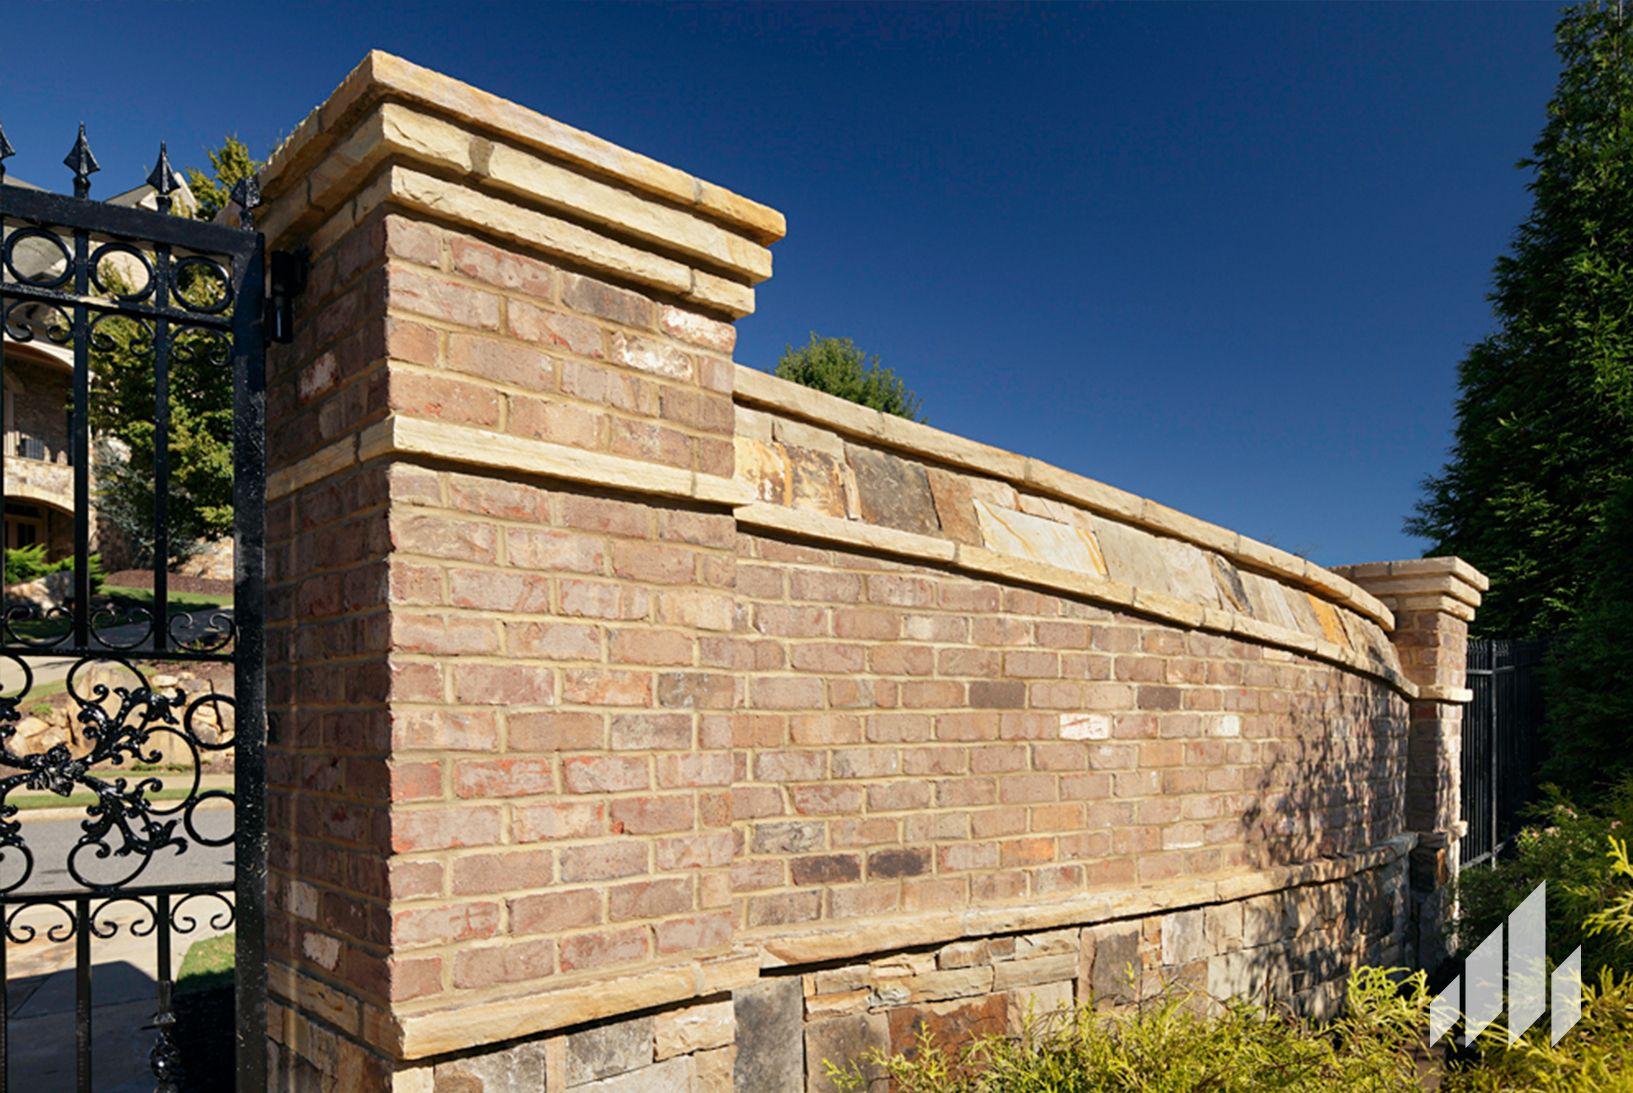 General Shale Silas Lucas Brick Brick Wall Gardens Concrete Pavers Brick